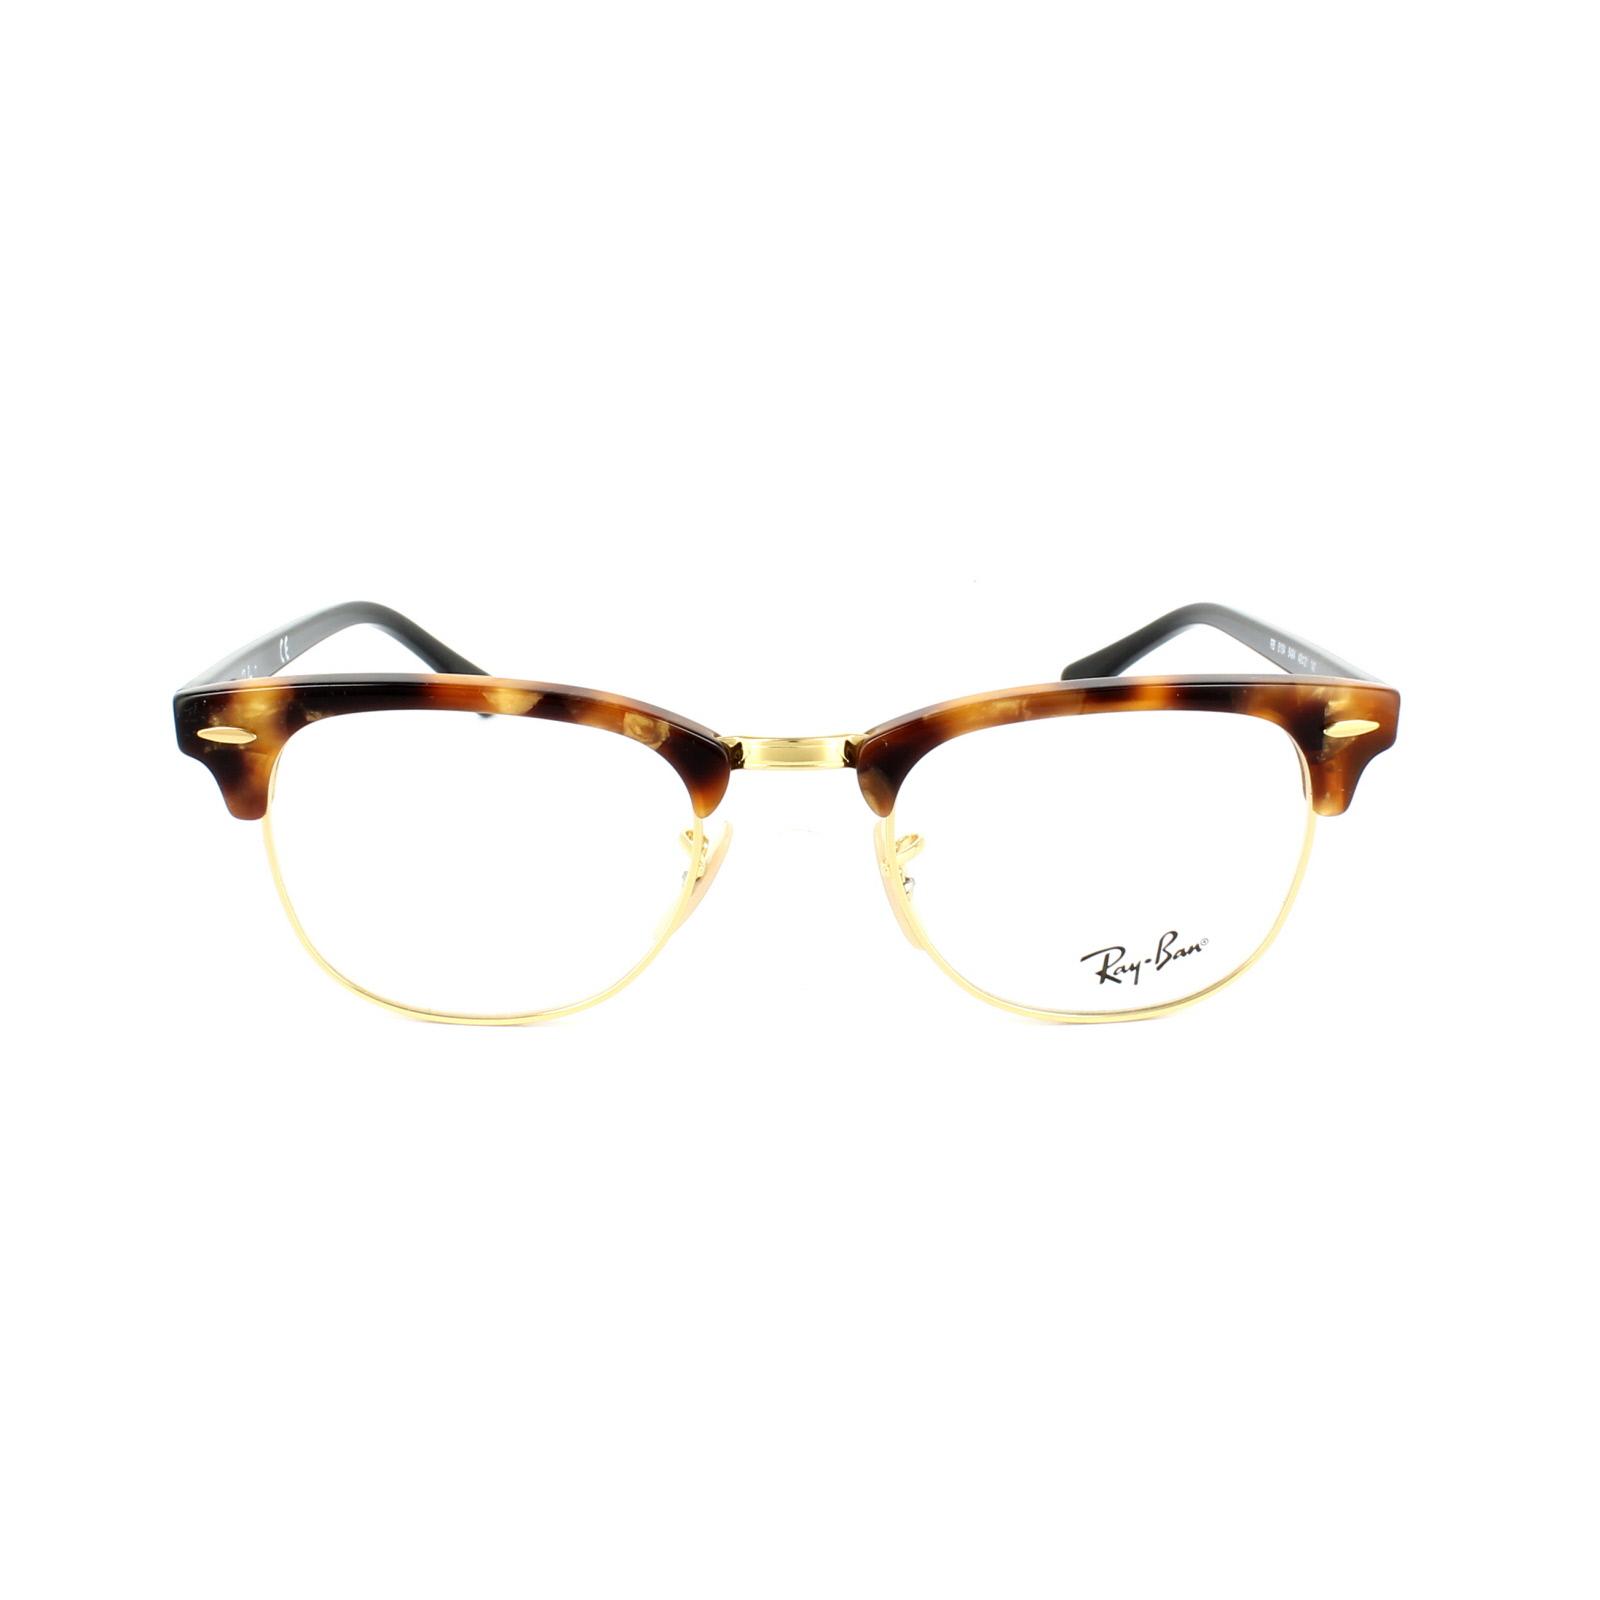 Ray-Ban Glasses Frames 5154 Clubmaster 5494 Fleck Brown Havana